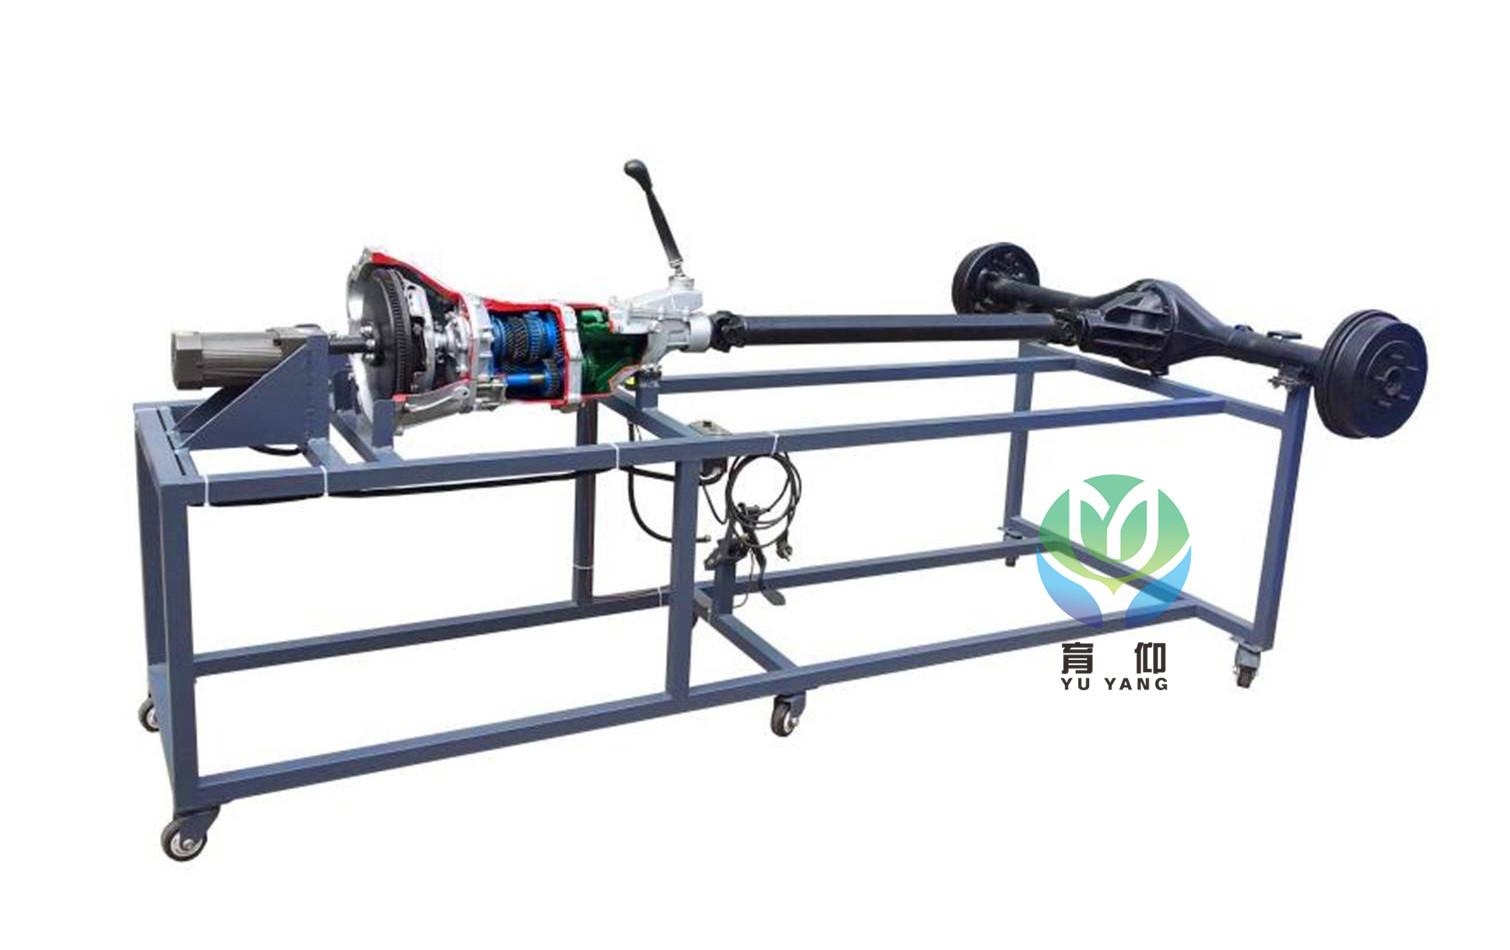 yuy-7048汽车传动系统实训台(丰田金杯海狮) 汽车底盘